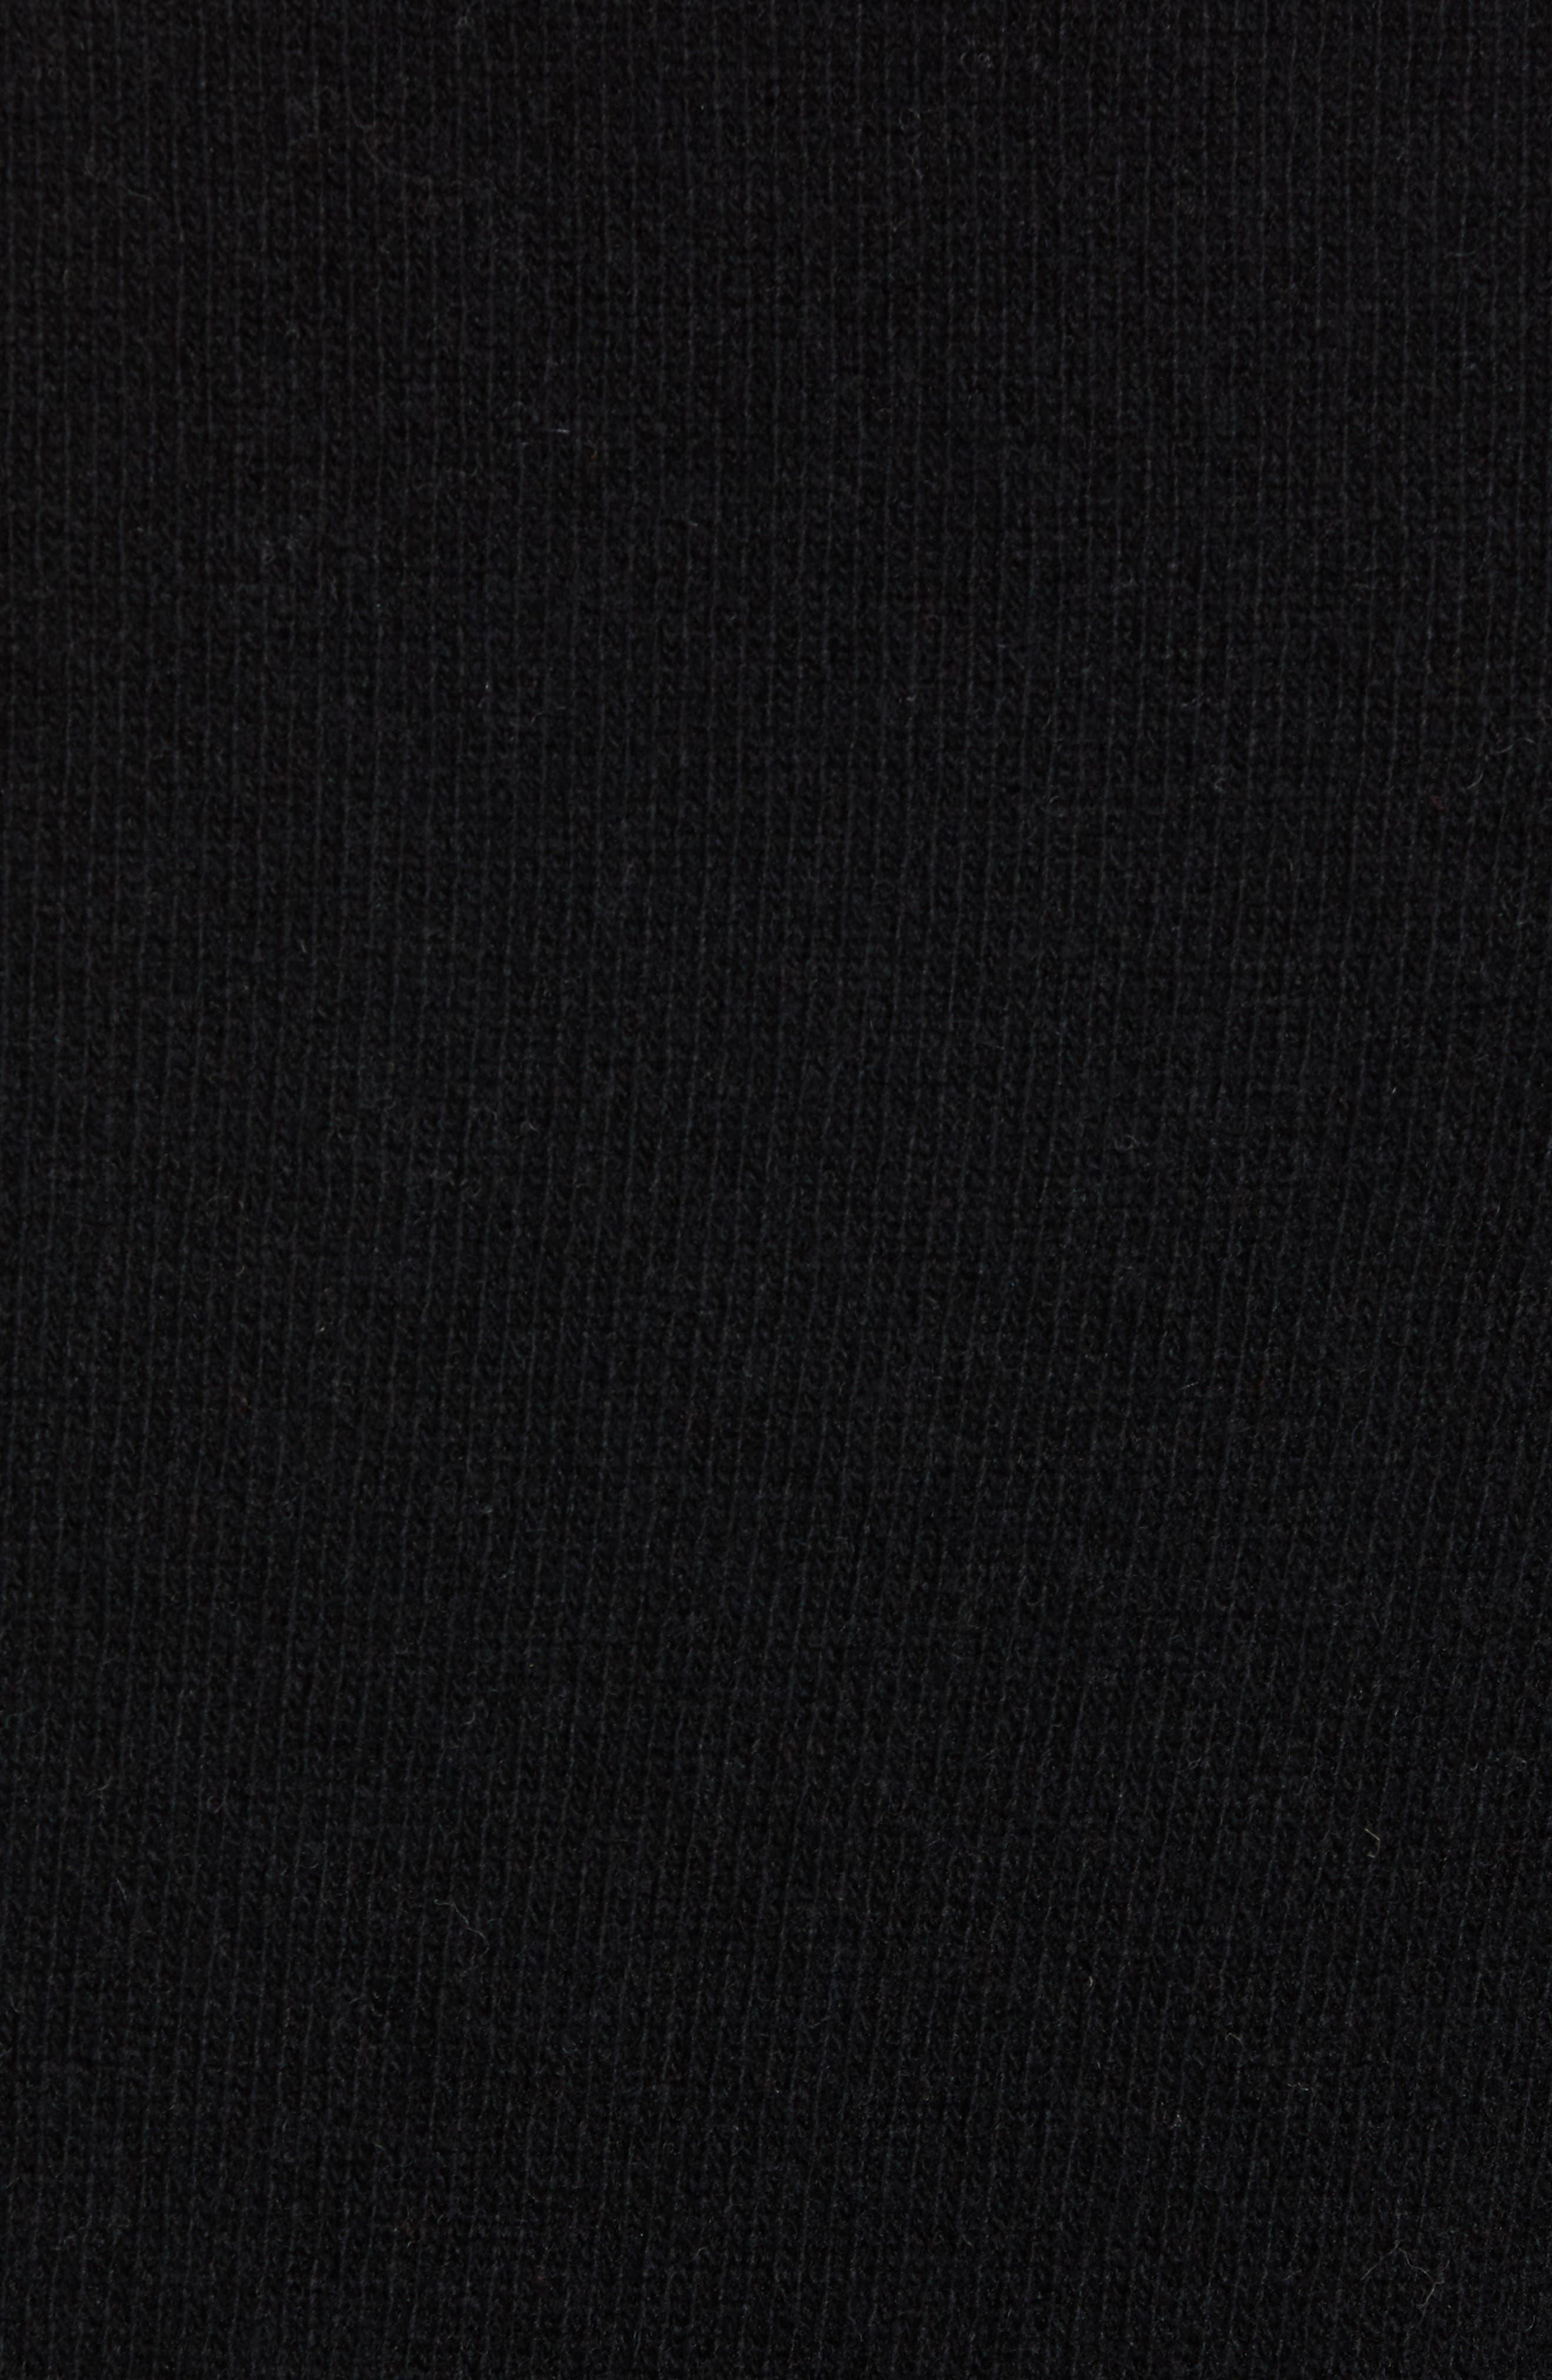 Bonjour Wool Blend Sweater,                             Alternate thumbnail 5, color,                             BLACK WHITECAP GREY